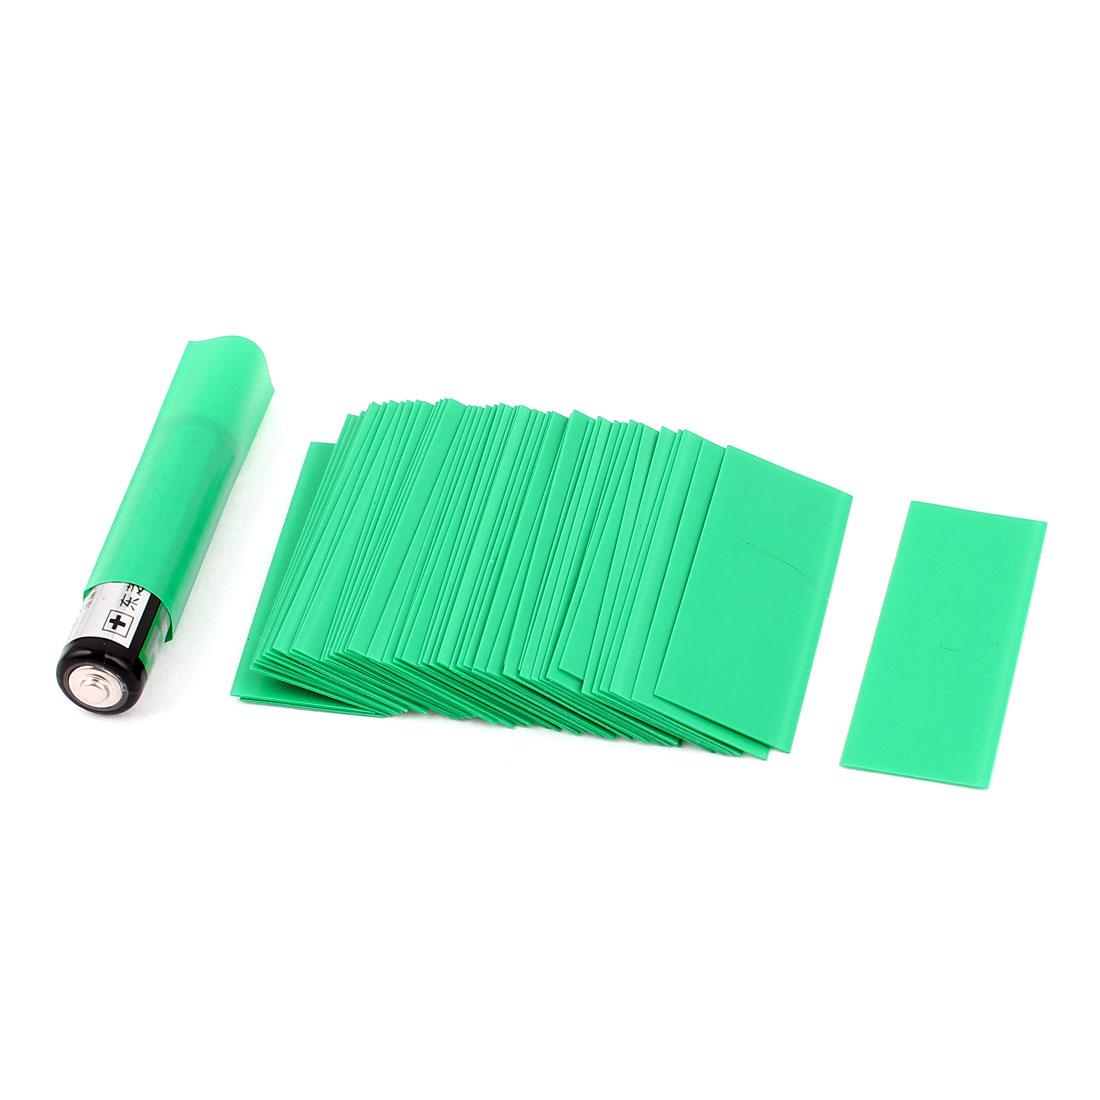 50pcs 17mm Flat 10.8mm Dia PVC Heat Shrink Tubing Green for 1 x AAA Battery